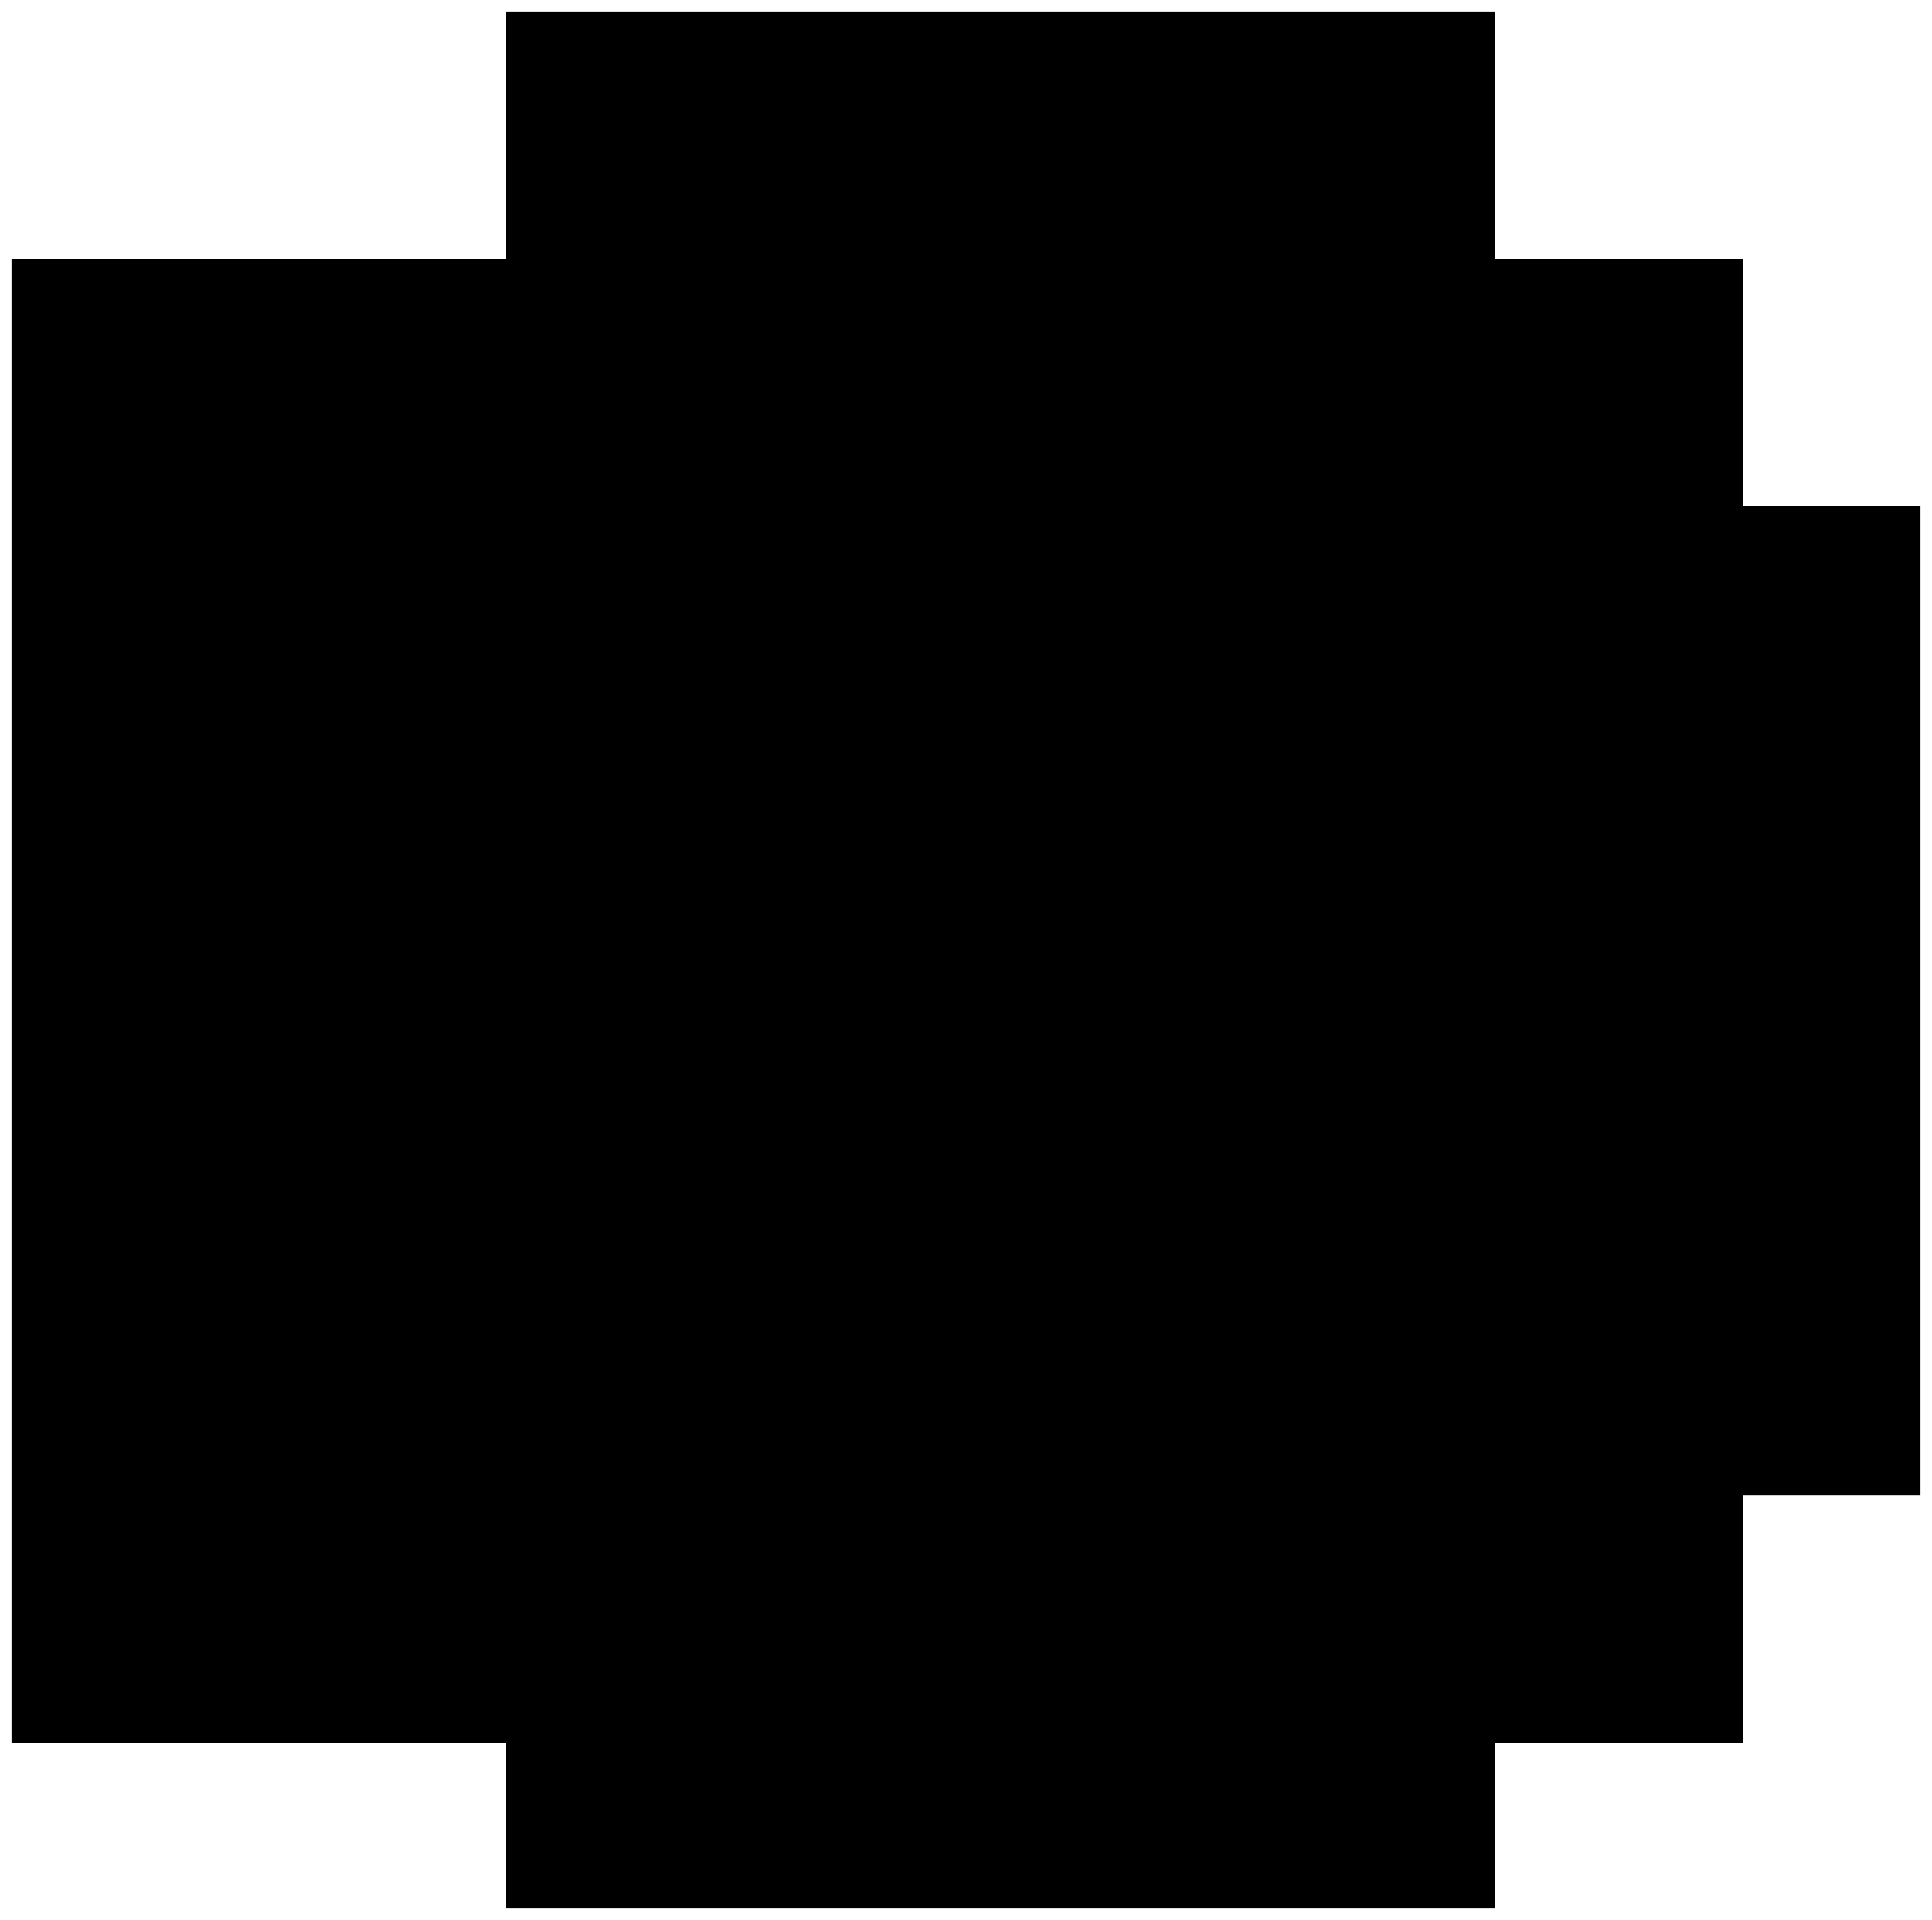 Mandala Decor PNG Clip Art Image.